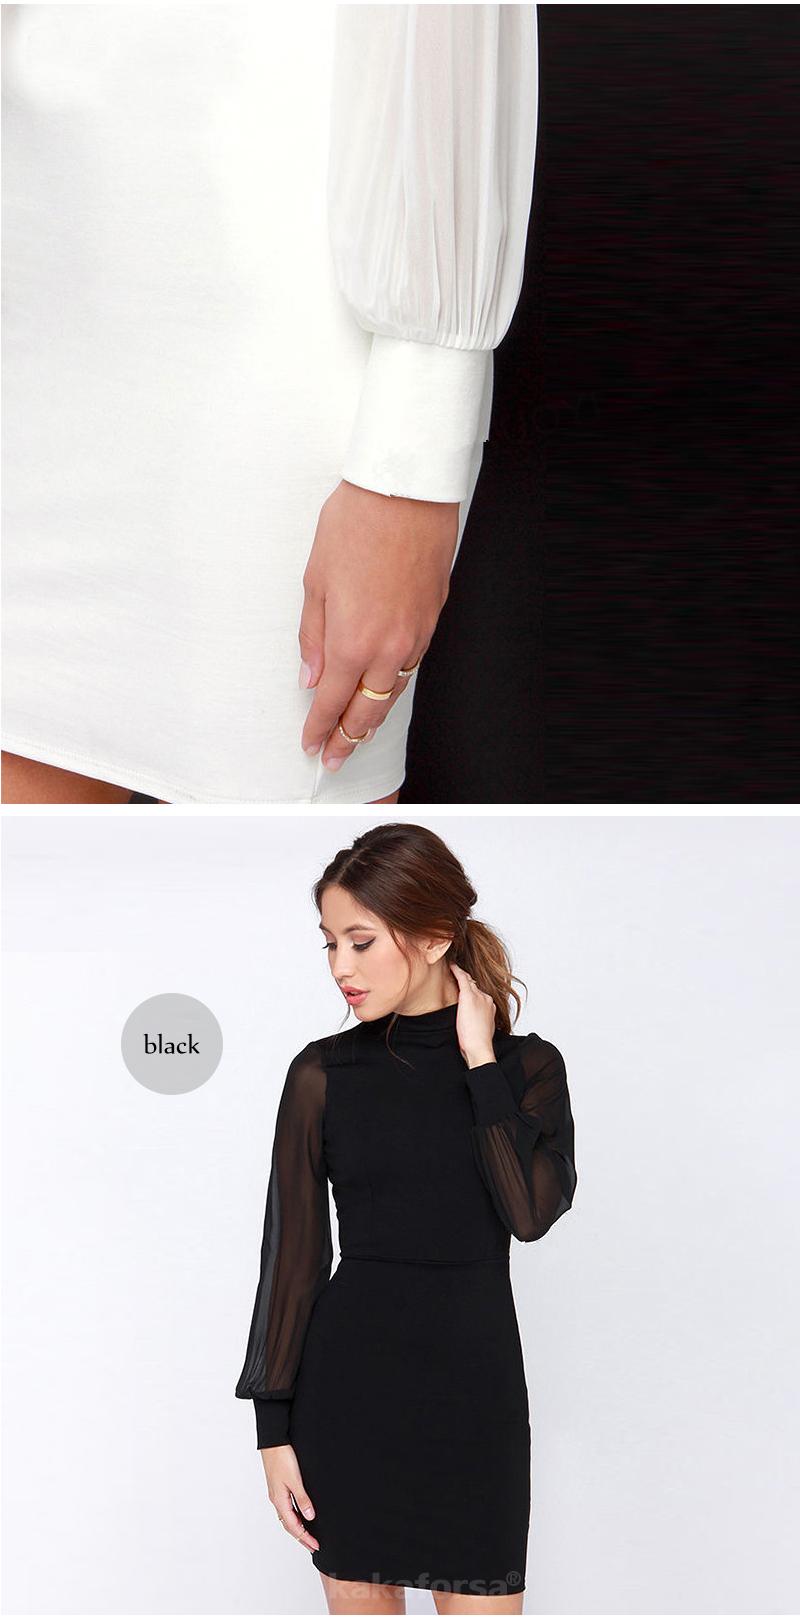 Kakaforsa Women Sexy Backless White Dress Casual Plus Size Slim Fit Bodycon Short Dress Long Sleeve O-Neck Mini Party Dresses 14